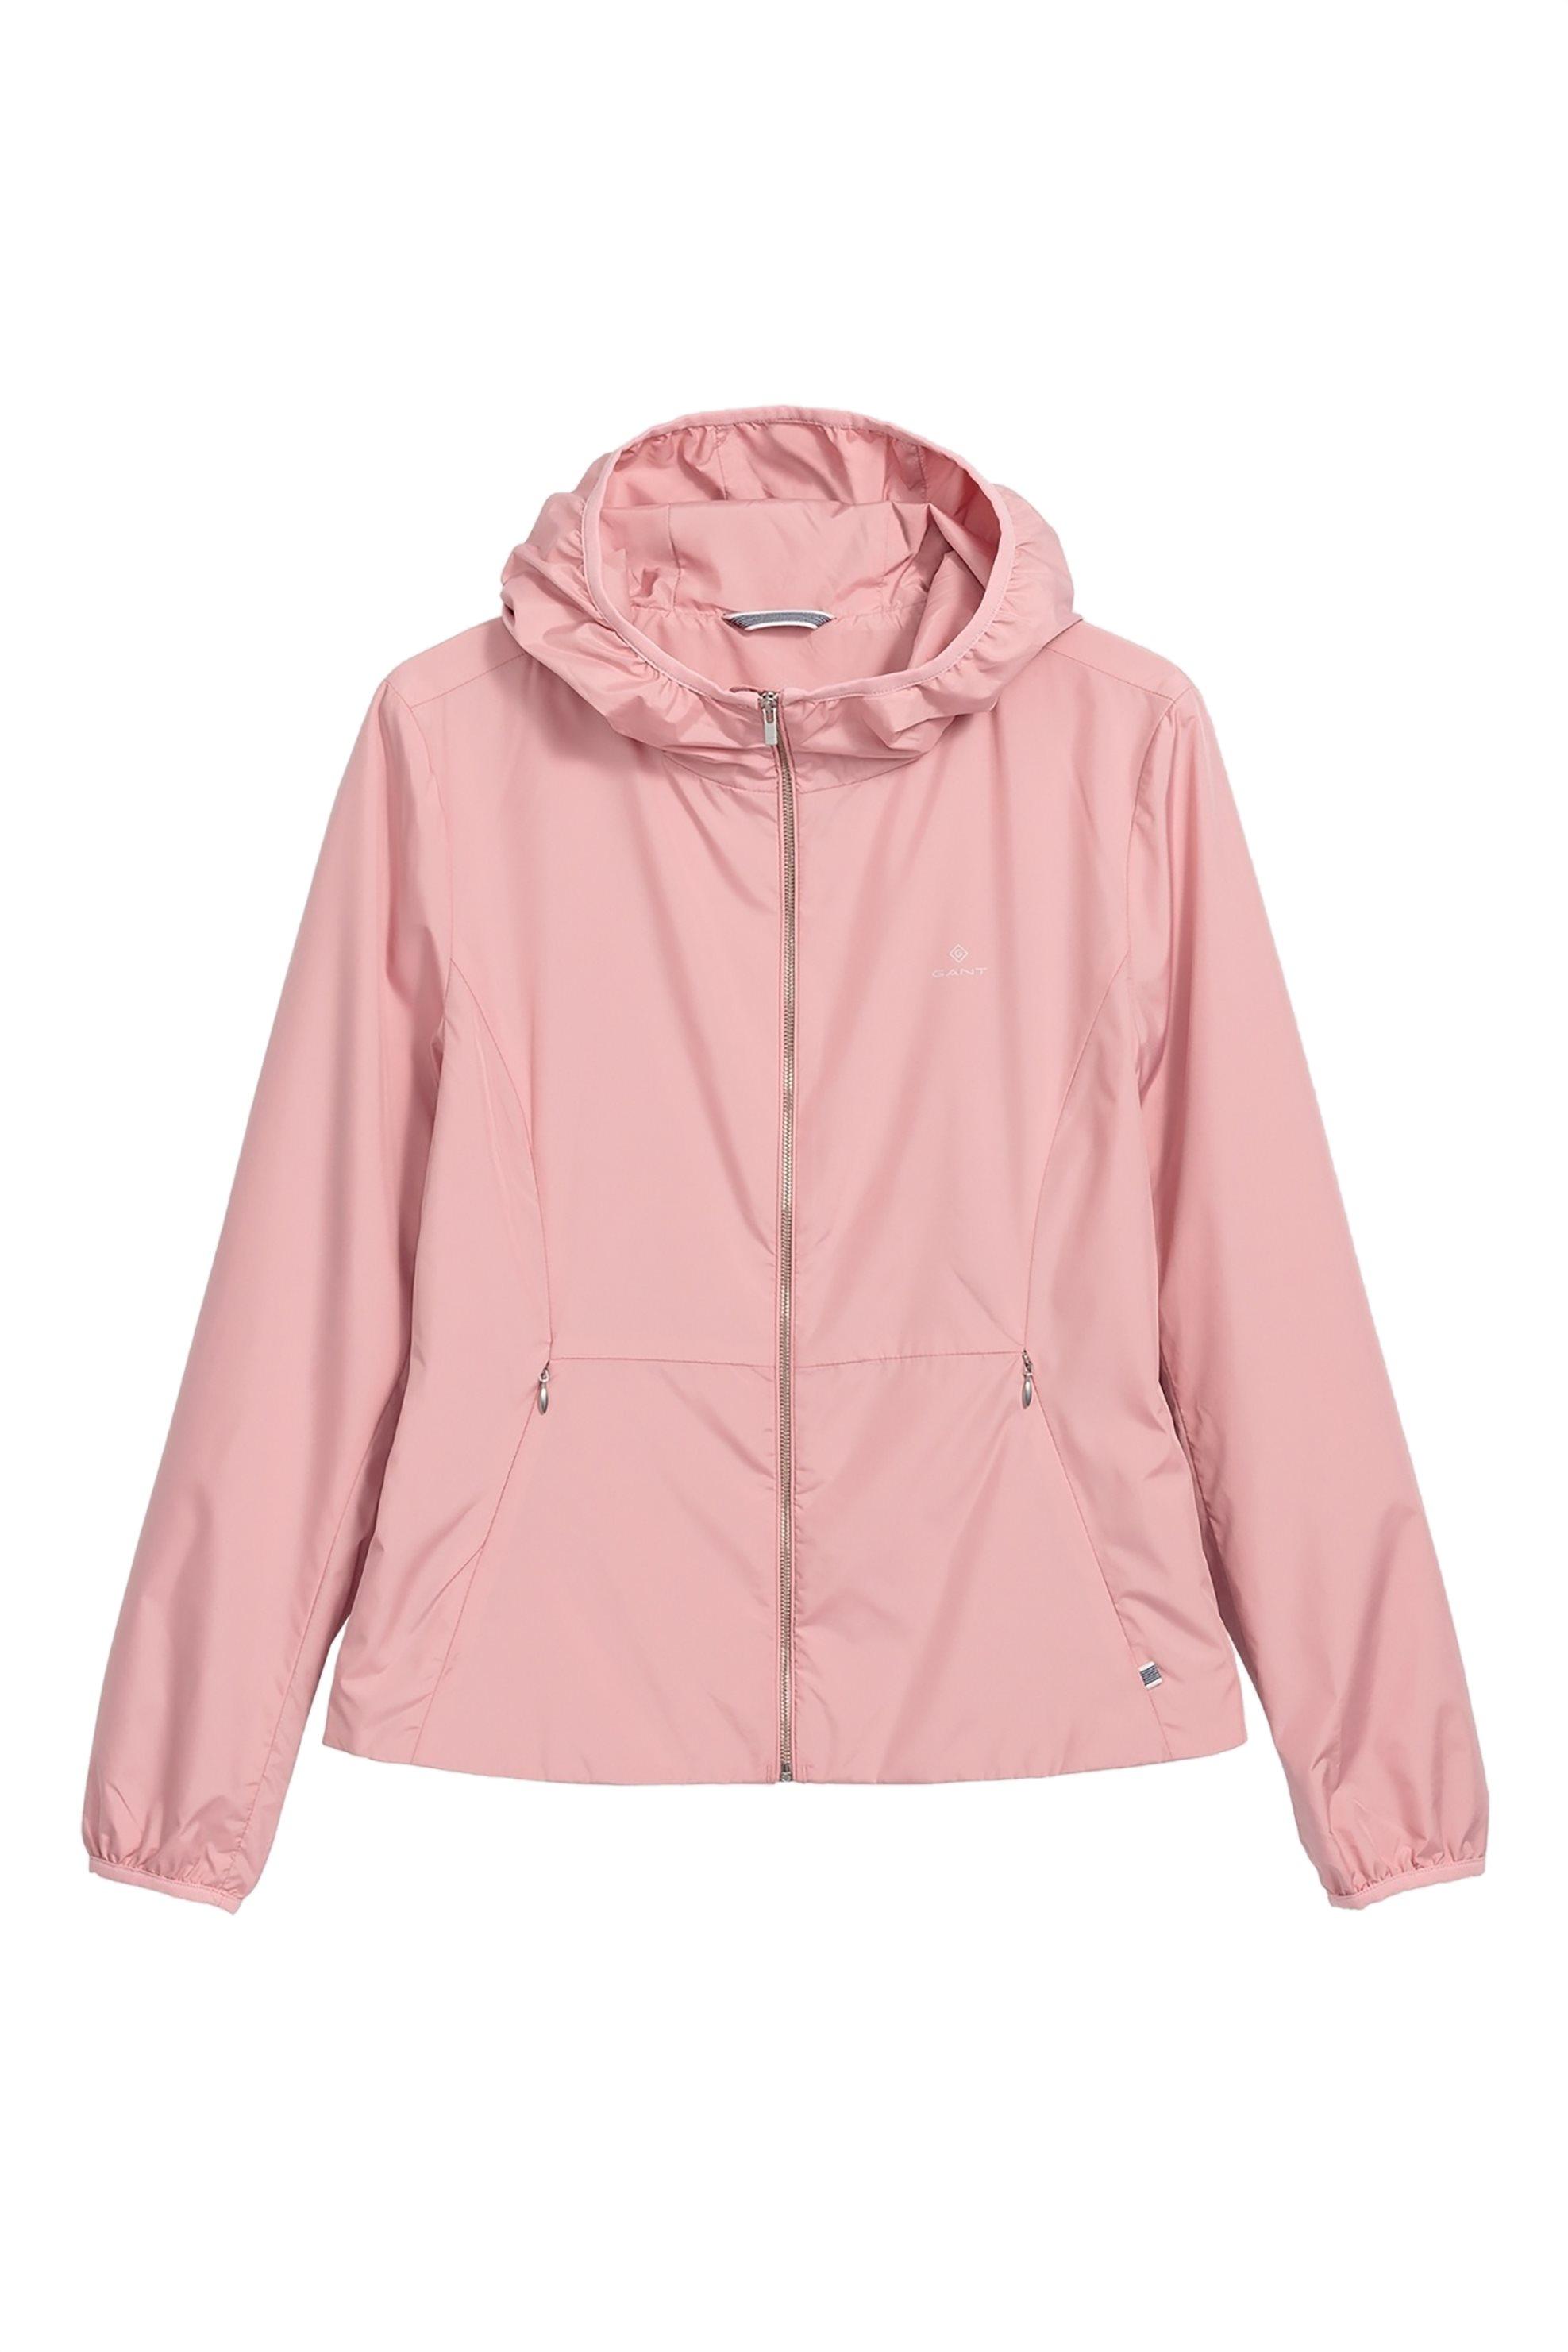 22b41ae88fdf Notos Gant γυναικείο μπουφάν Windbreaker - 4700071 - Ροζ